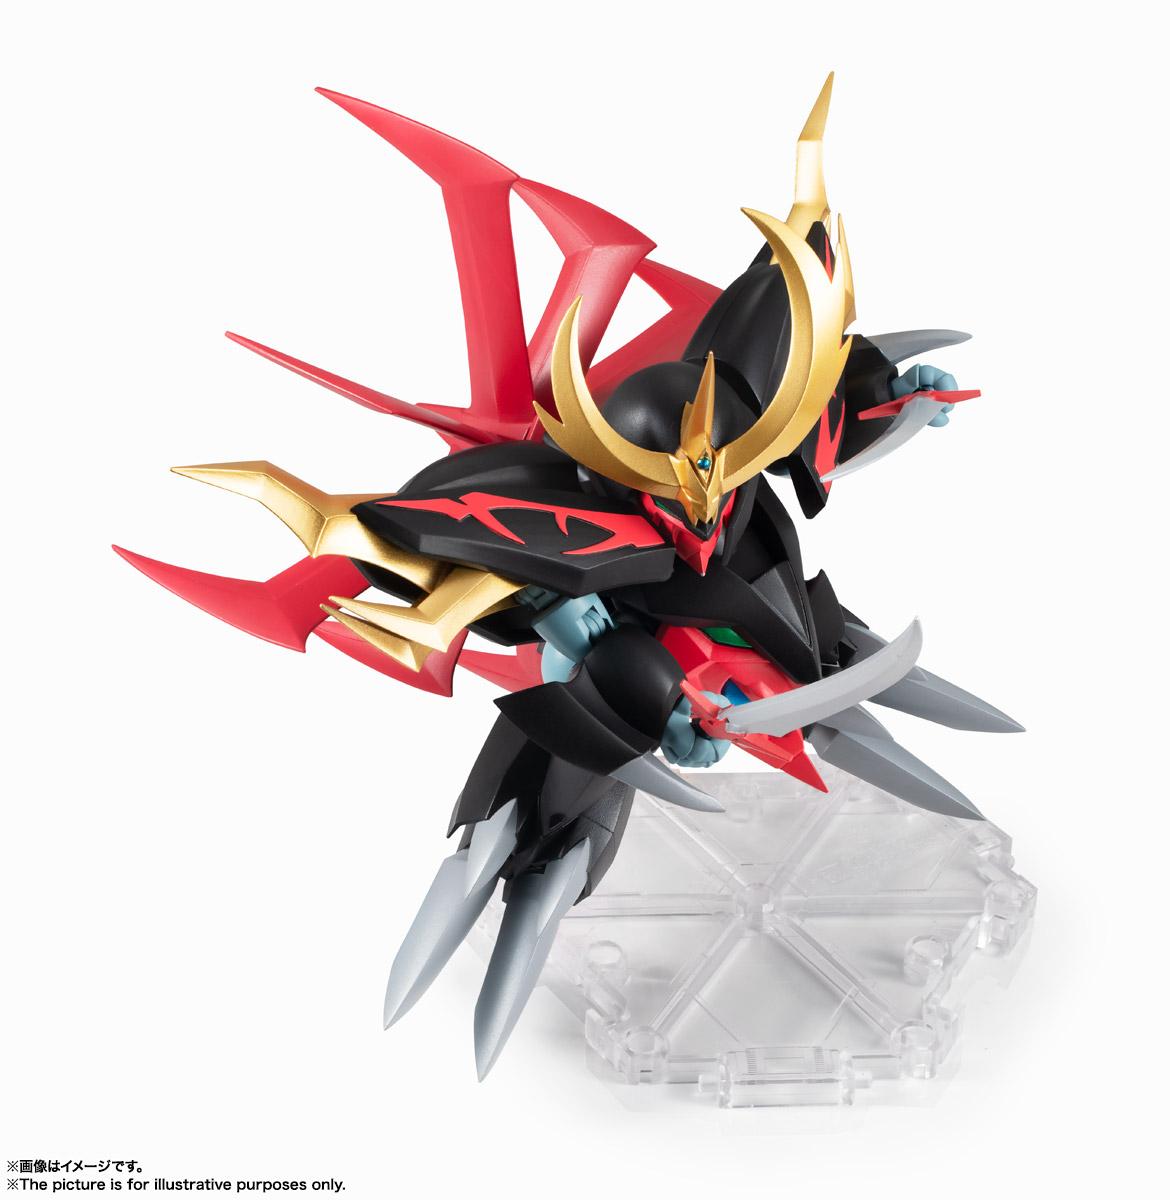 NXEDGE STYLE[MASHIN UNIT]『邪戦角』魔神英雄伝ワタル 可動フィギュア-003